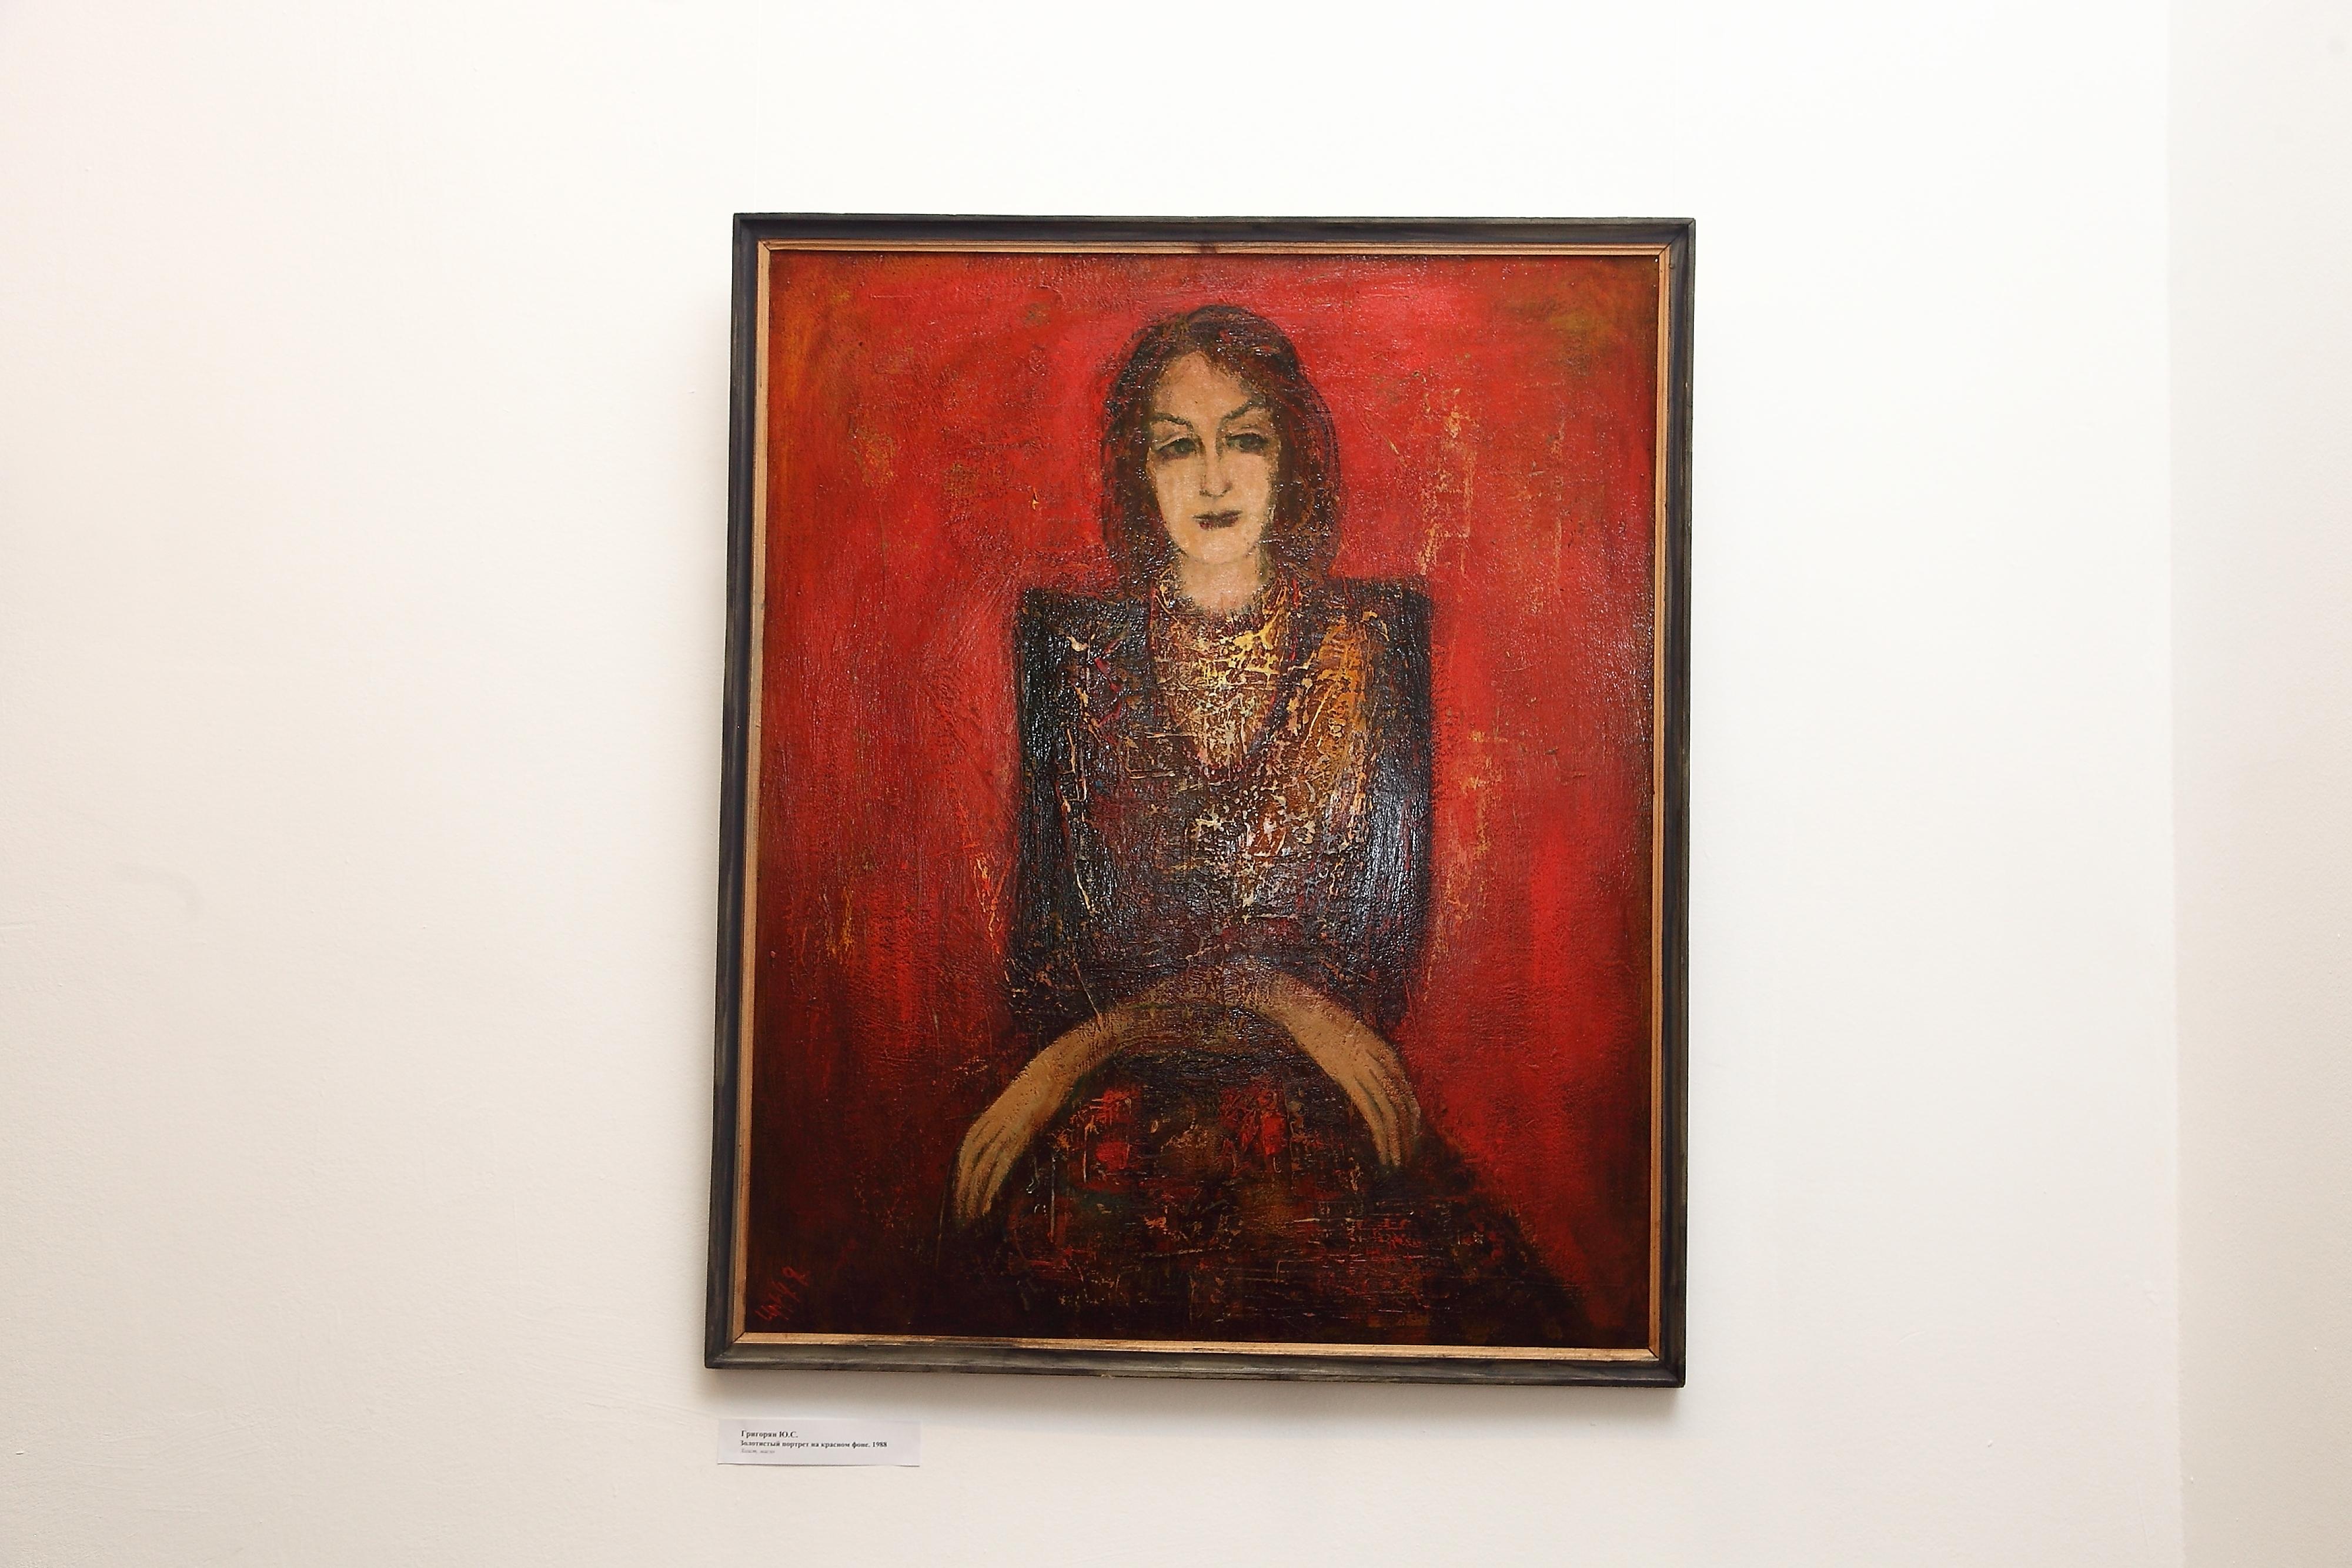 портрет на красном фоне 1988 хм - Золотистый портрет на красном фоне, 104х86, картон/масло, 1988